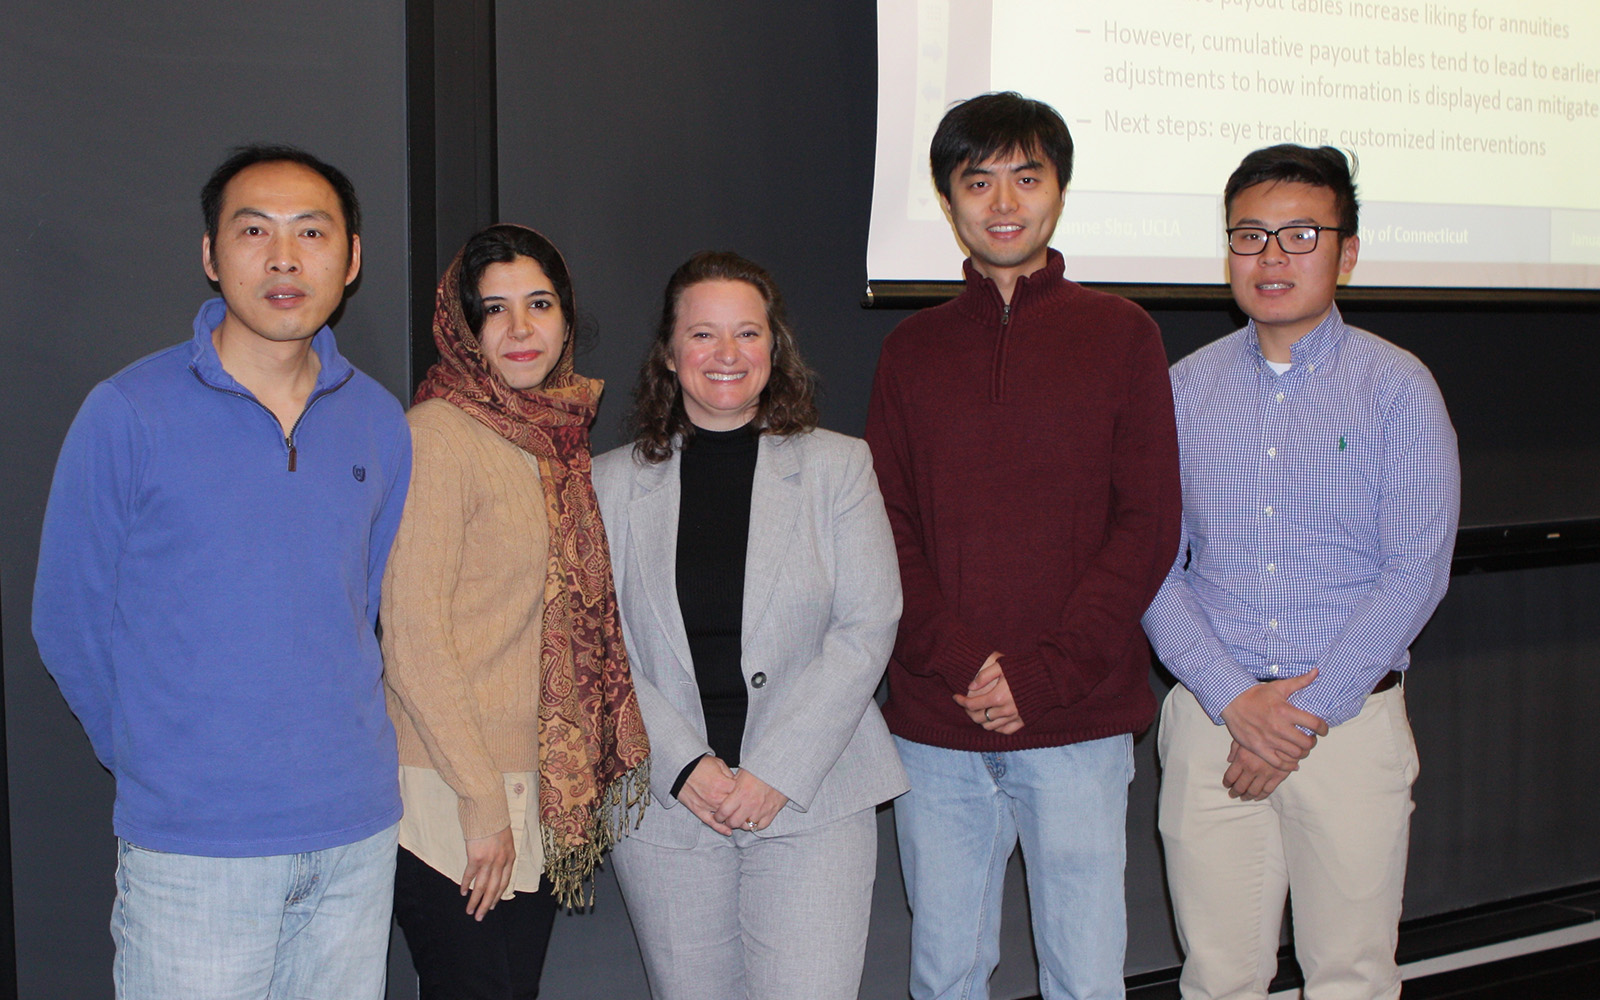 Suzanne Shu (centered) with Ph.D. Students Bin Li, Zahra Tohidinia, Lu Huang, and Qizhou Wang. (Nancy White/UConn School of Business)